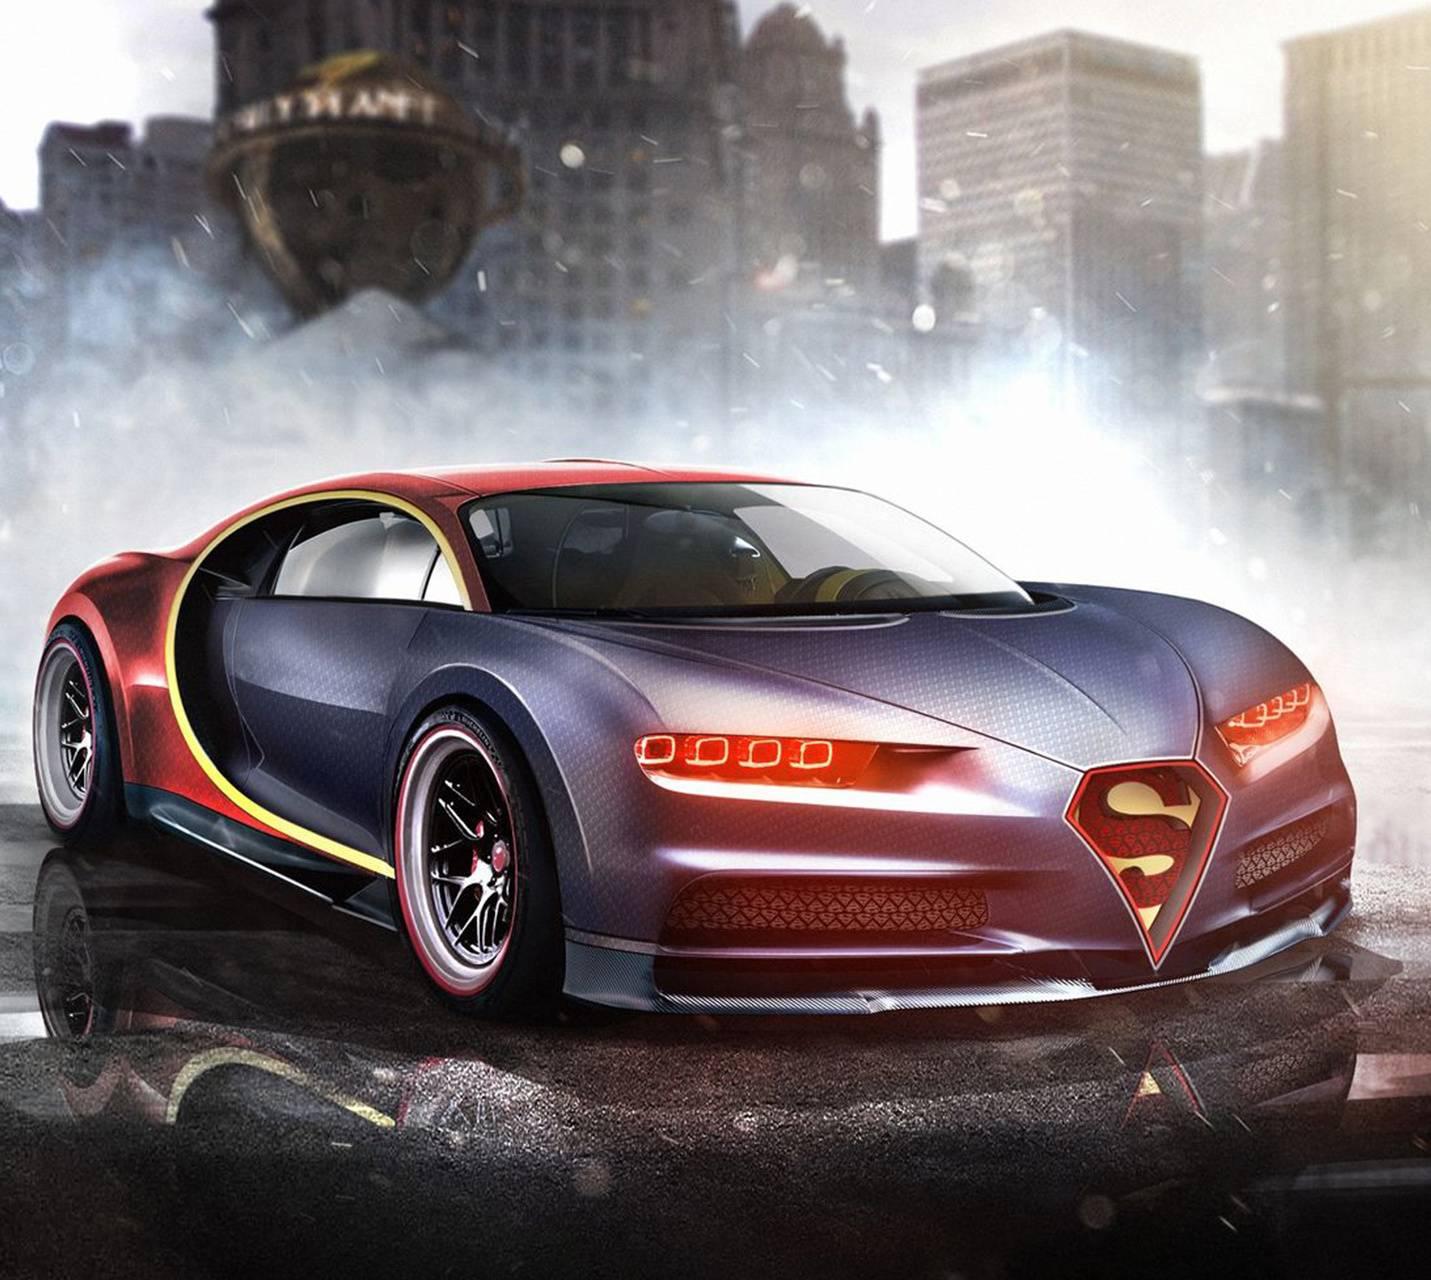 Superman Bugatti Wallpaper By ILovedUB4